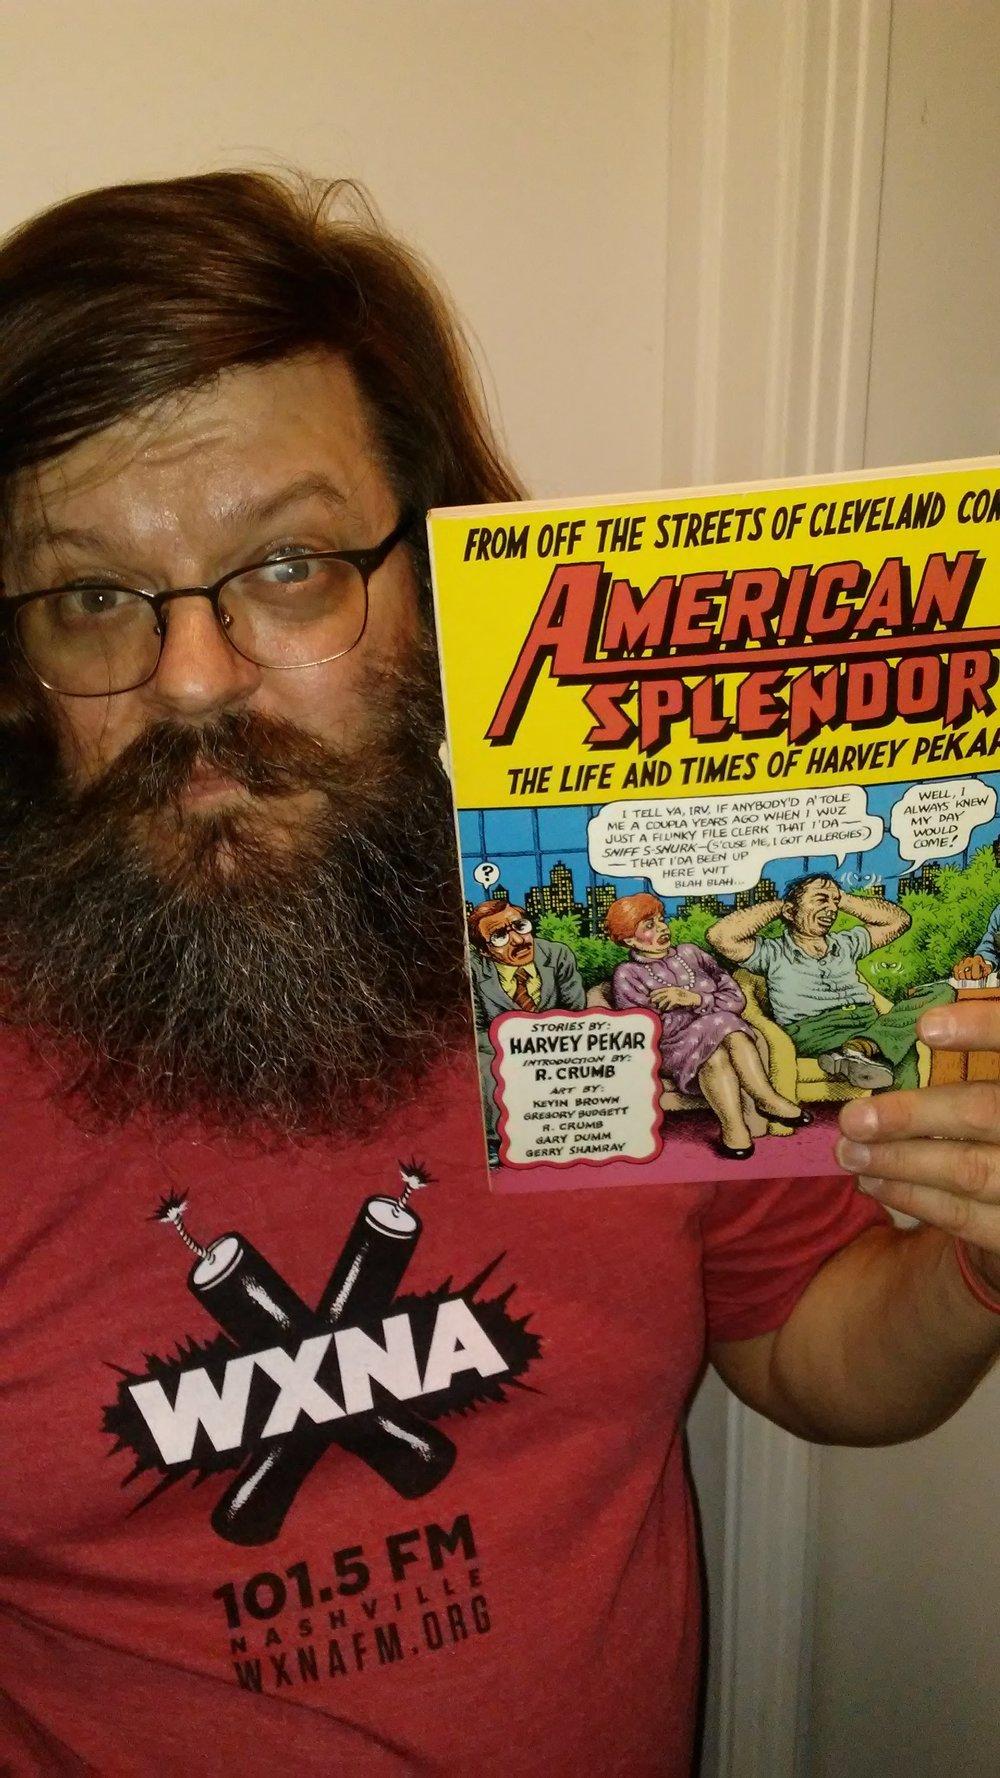 DJ rhatfinkThe ContinentalThursdays, 7-9 AMAmerican SplendorHarvey PekarHarvey Pekar / Dark Horse Comics / DC Comics -